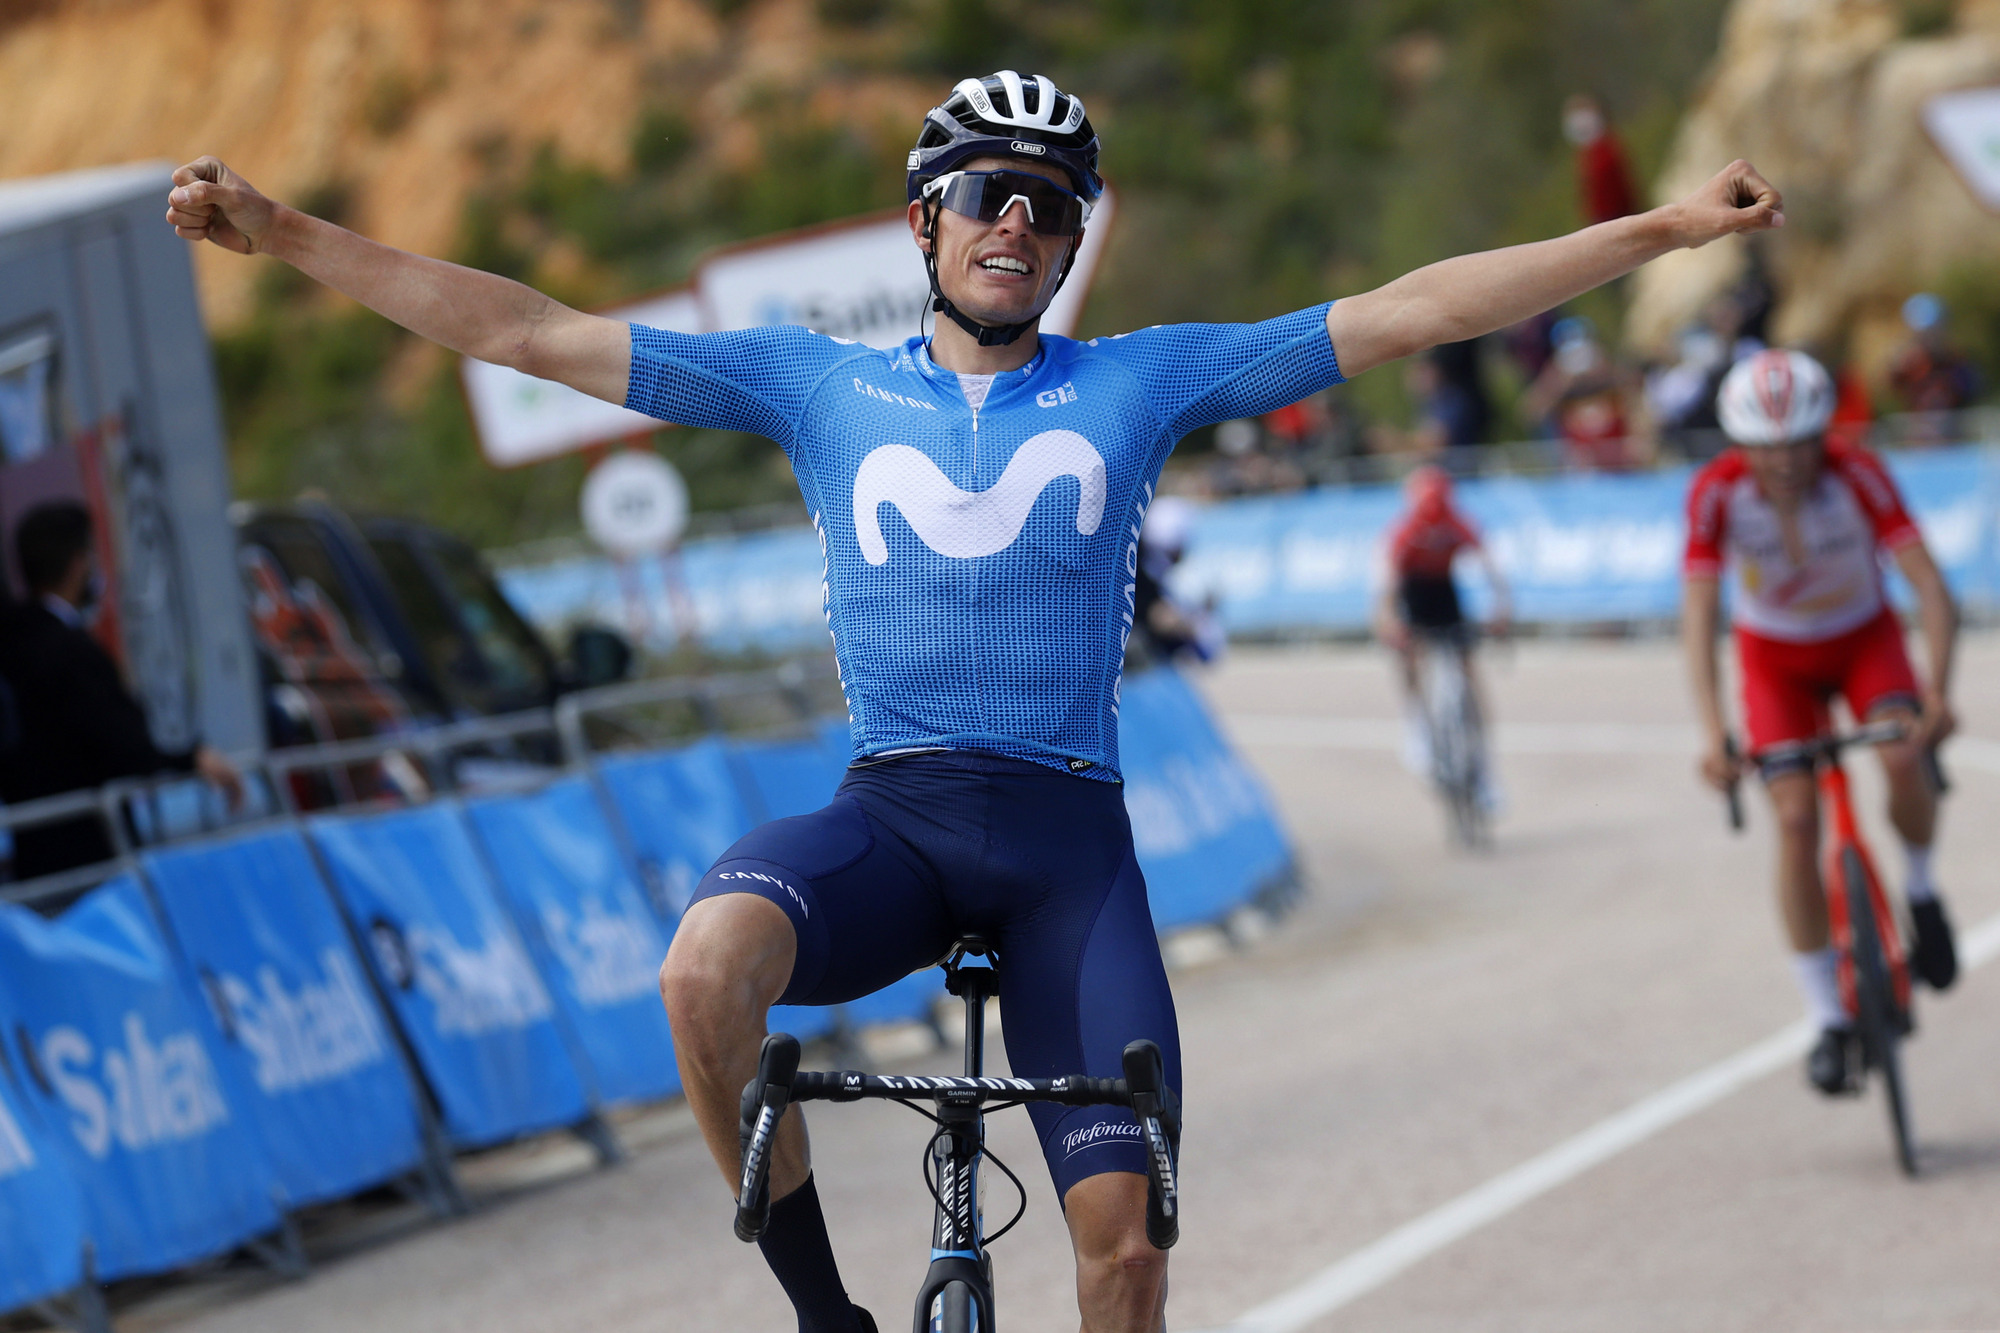 Volta a la Comunitat Valenciana 2021 - 72nd Edition - 3rd stage Torrent - Alto de la Reina 165 km - 16/04/2021 - Enric Mas (ESP - Movistar Team) - photo Luis Angel Gomez/BettiniPhoto©2021